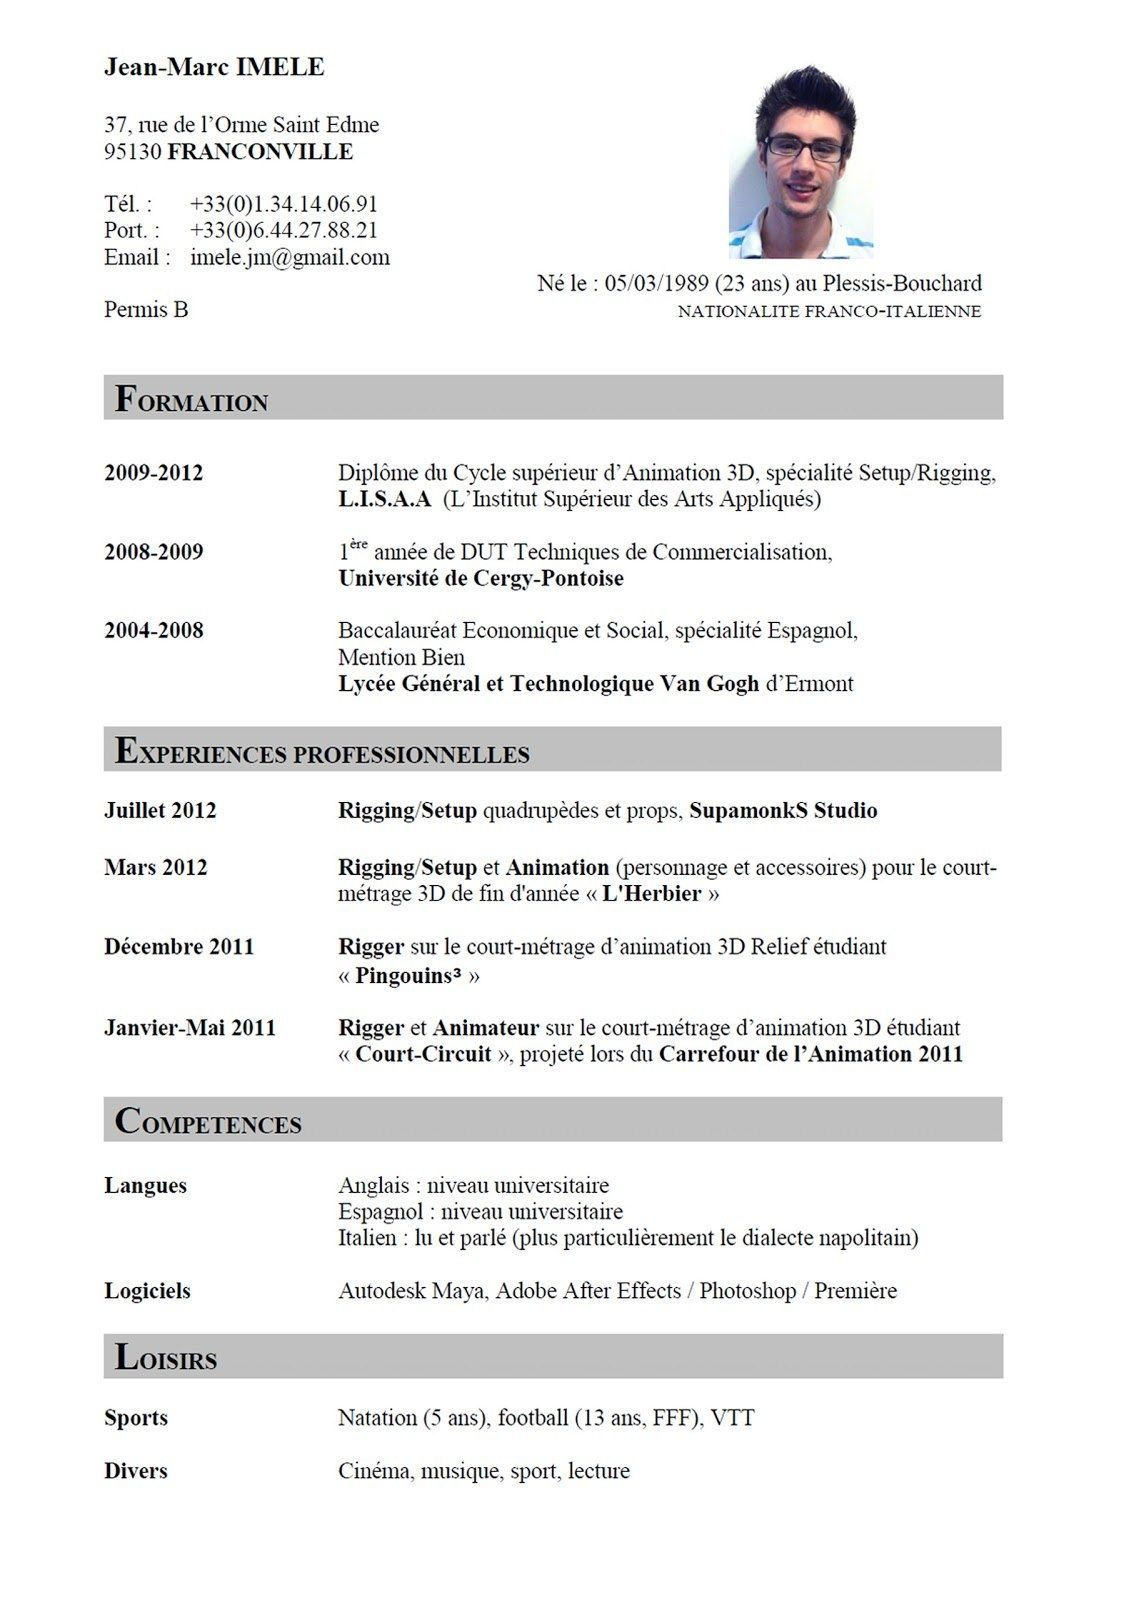 Francais Curriculum Vitae Template Ossaba Com Faire Cv En Anglais Sample Resume Format Resume Format Examples Resume Format Download